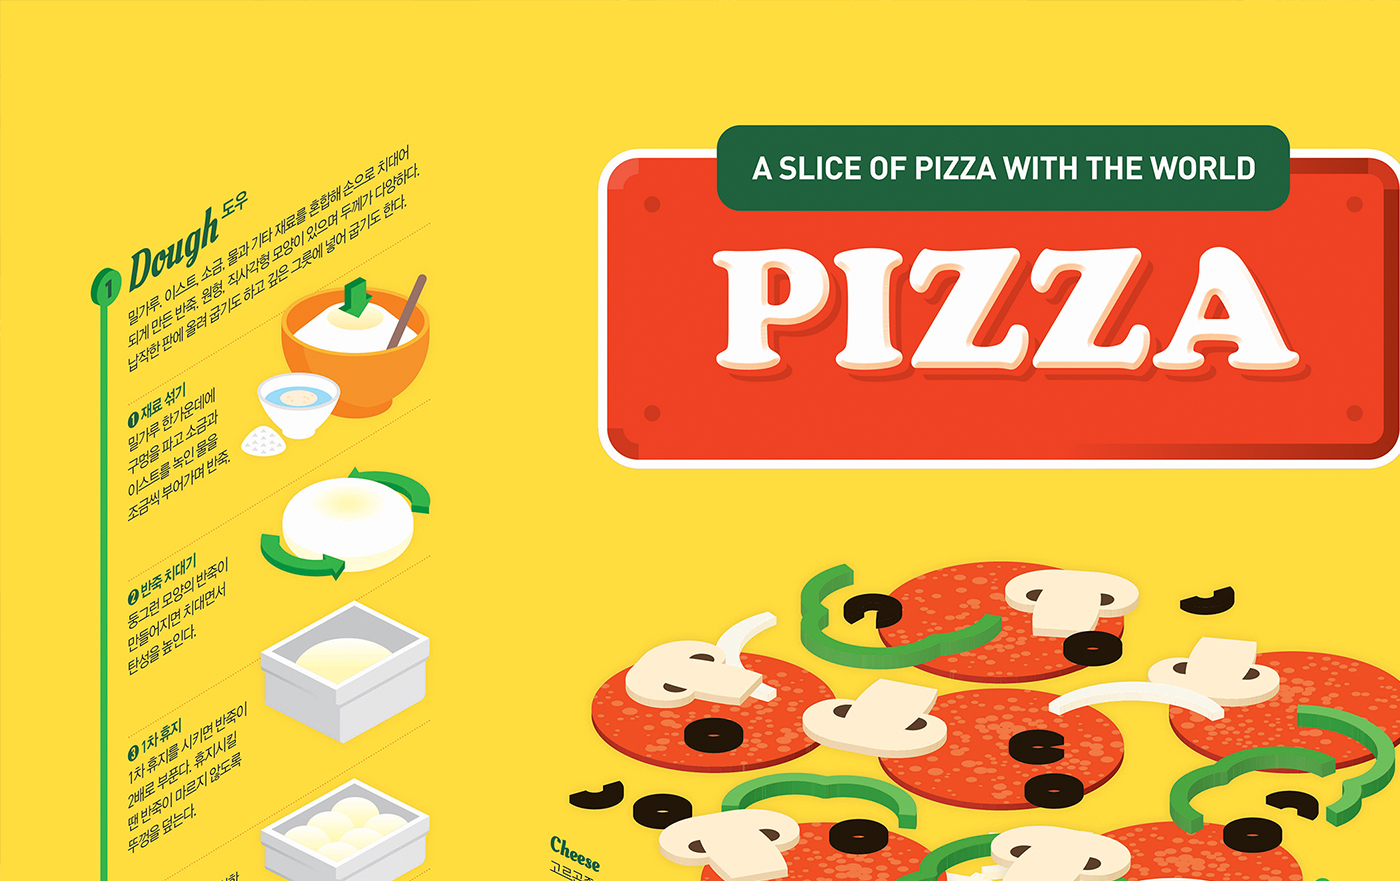 #Poster #Design #graphic design #infographic #infographics #data visualization #editorialdesign #food    #pizza #203x